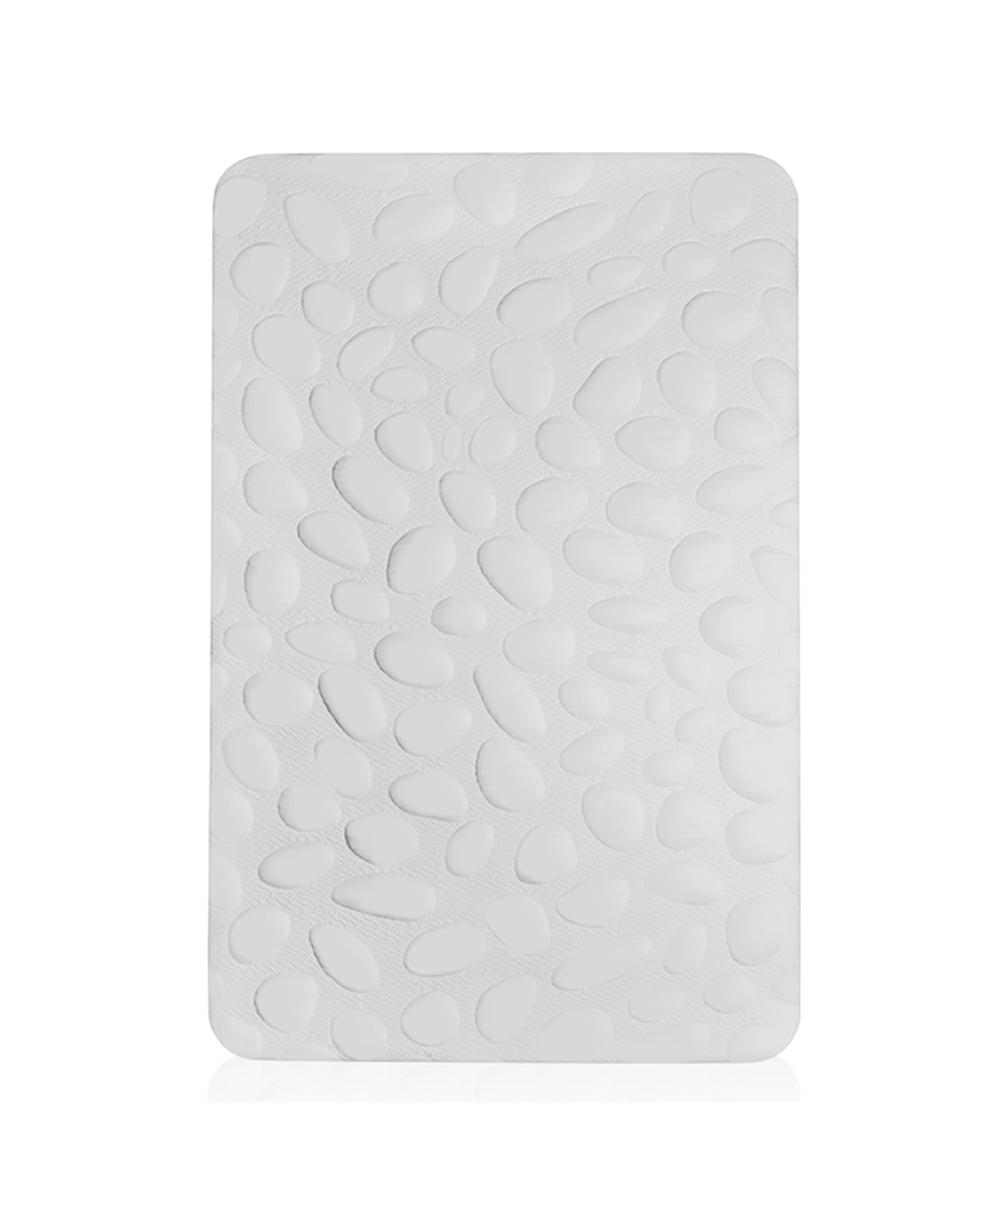 Nook Sleep - Pebble Pure Mini Crib Mattress Cloud